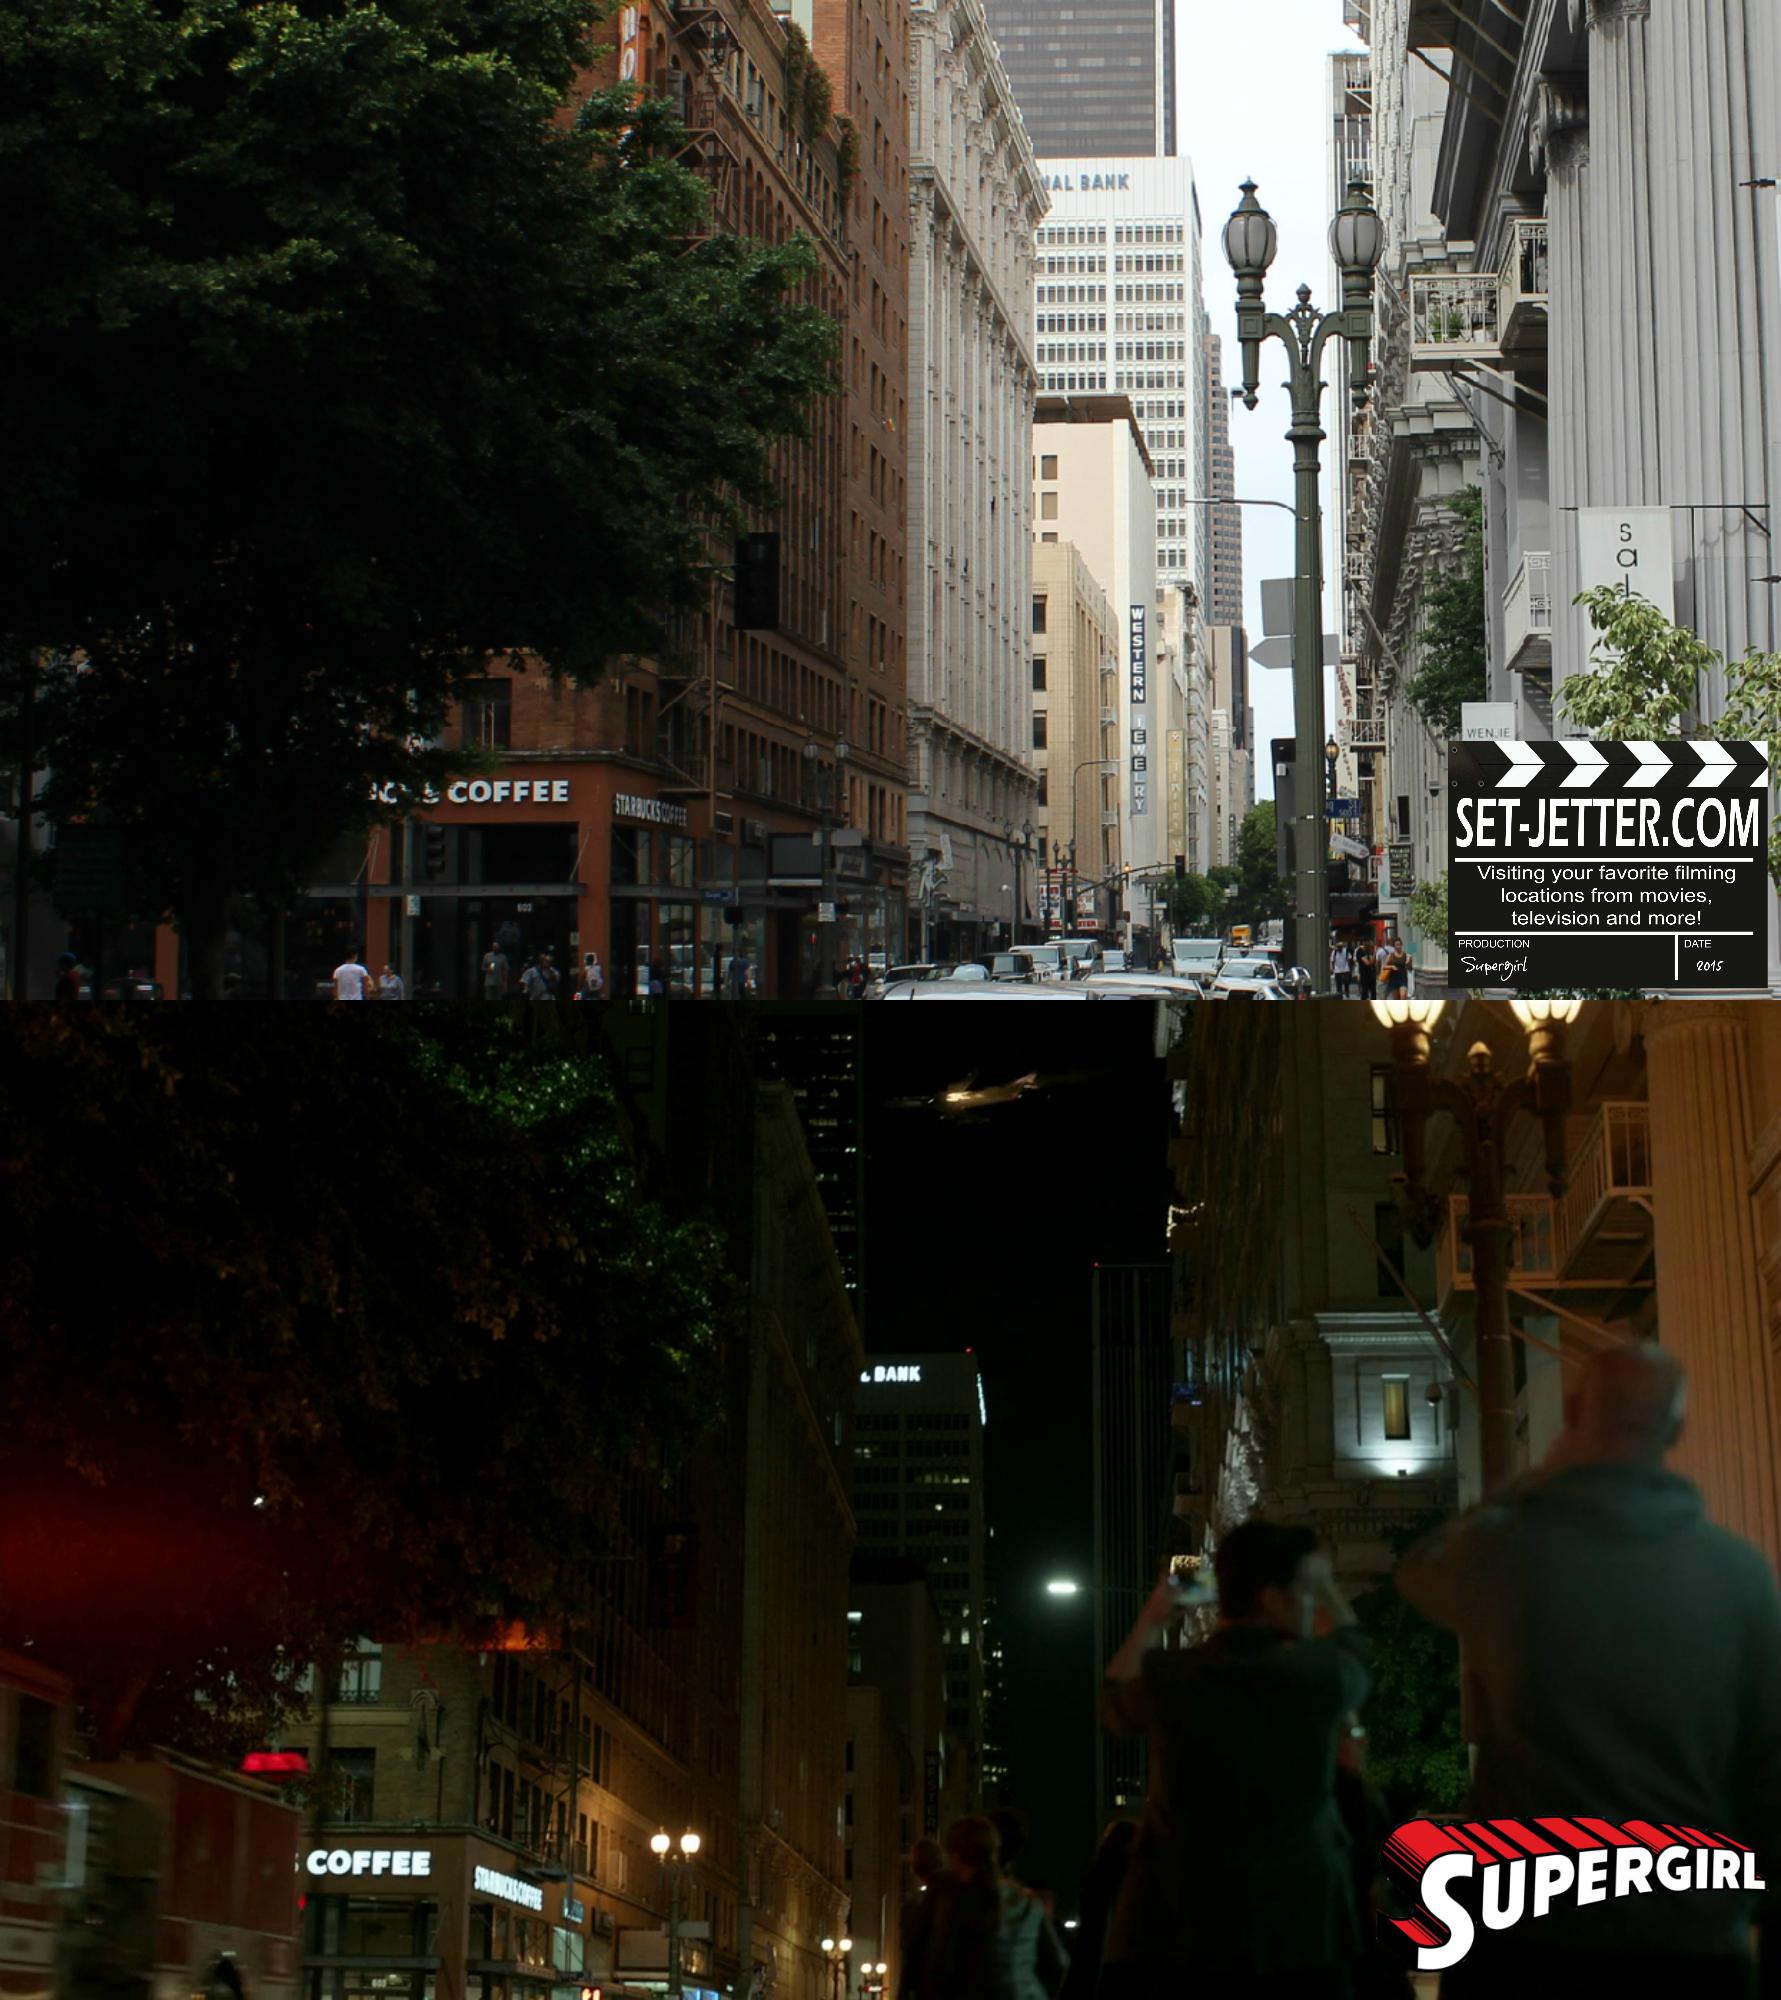 Supergirl comparison 14.jpg